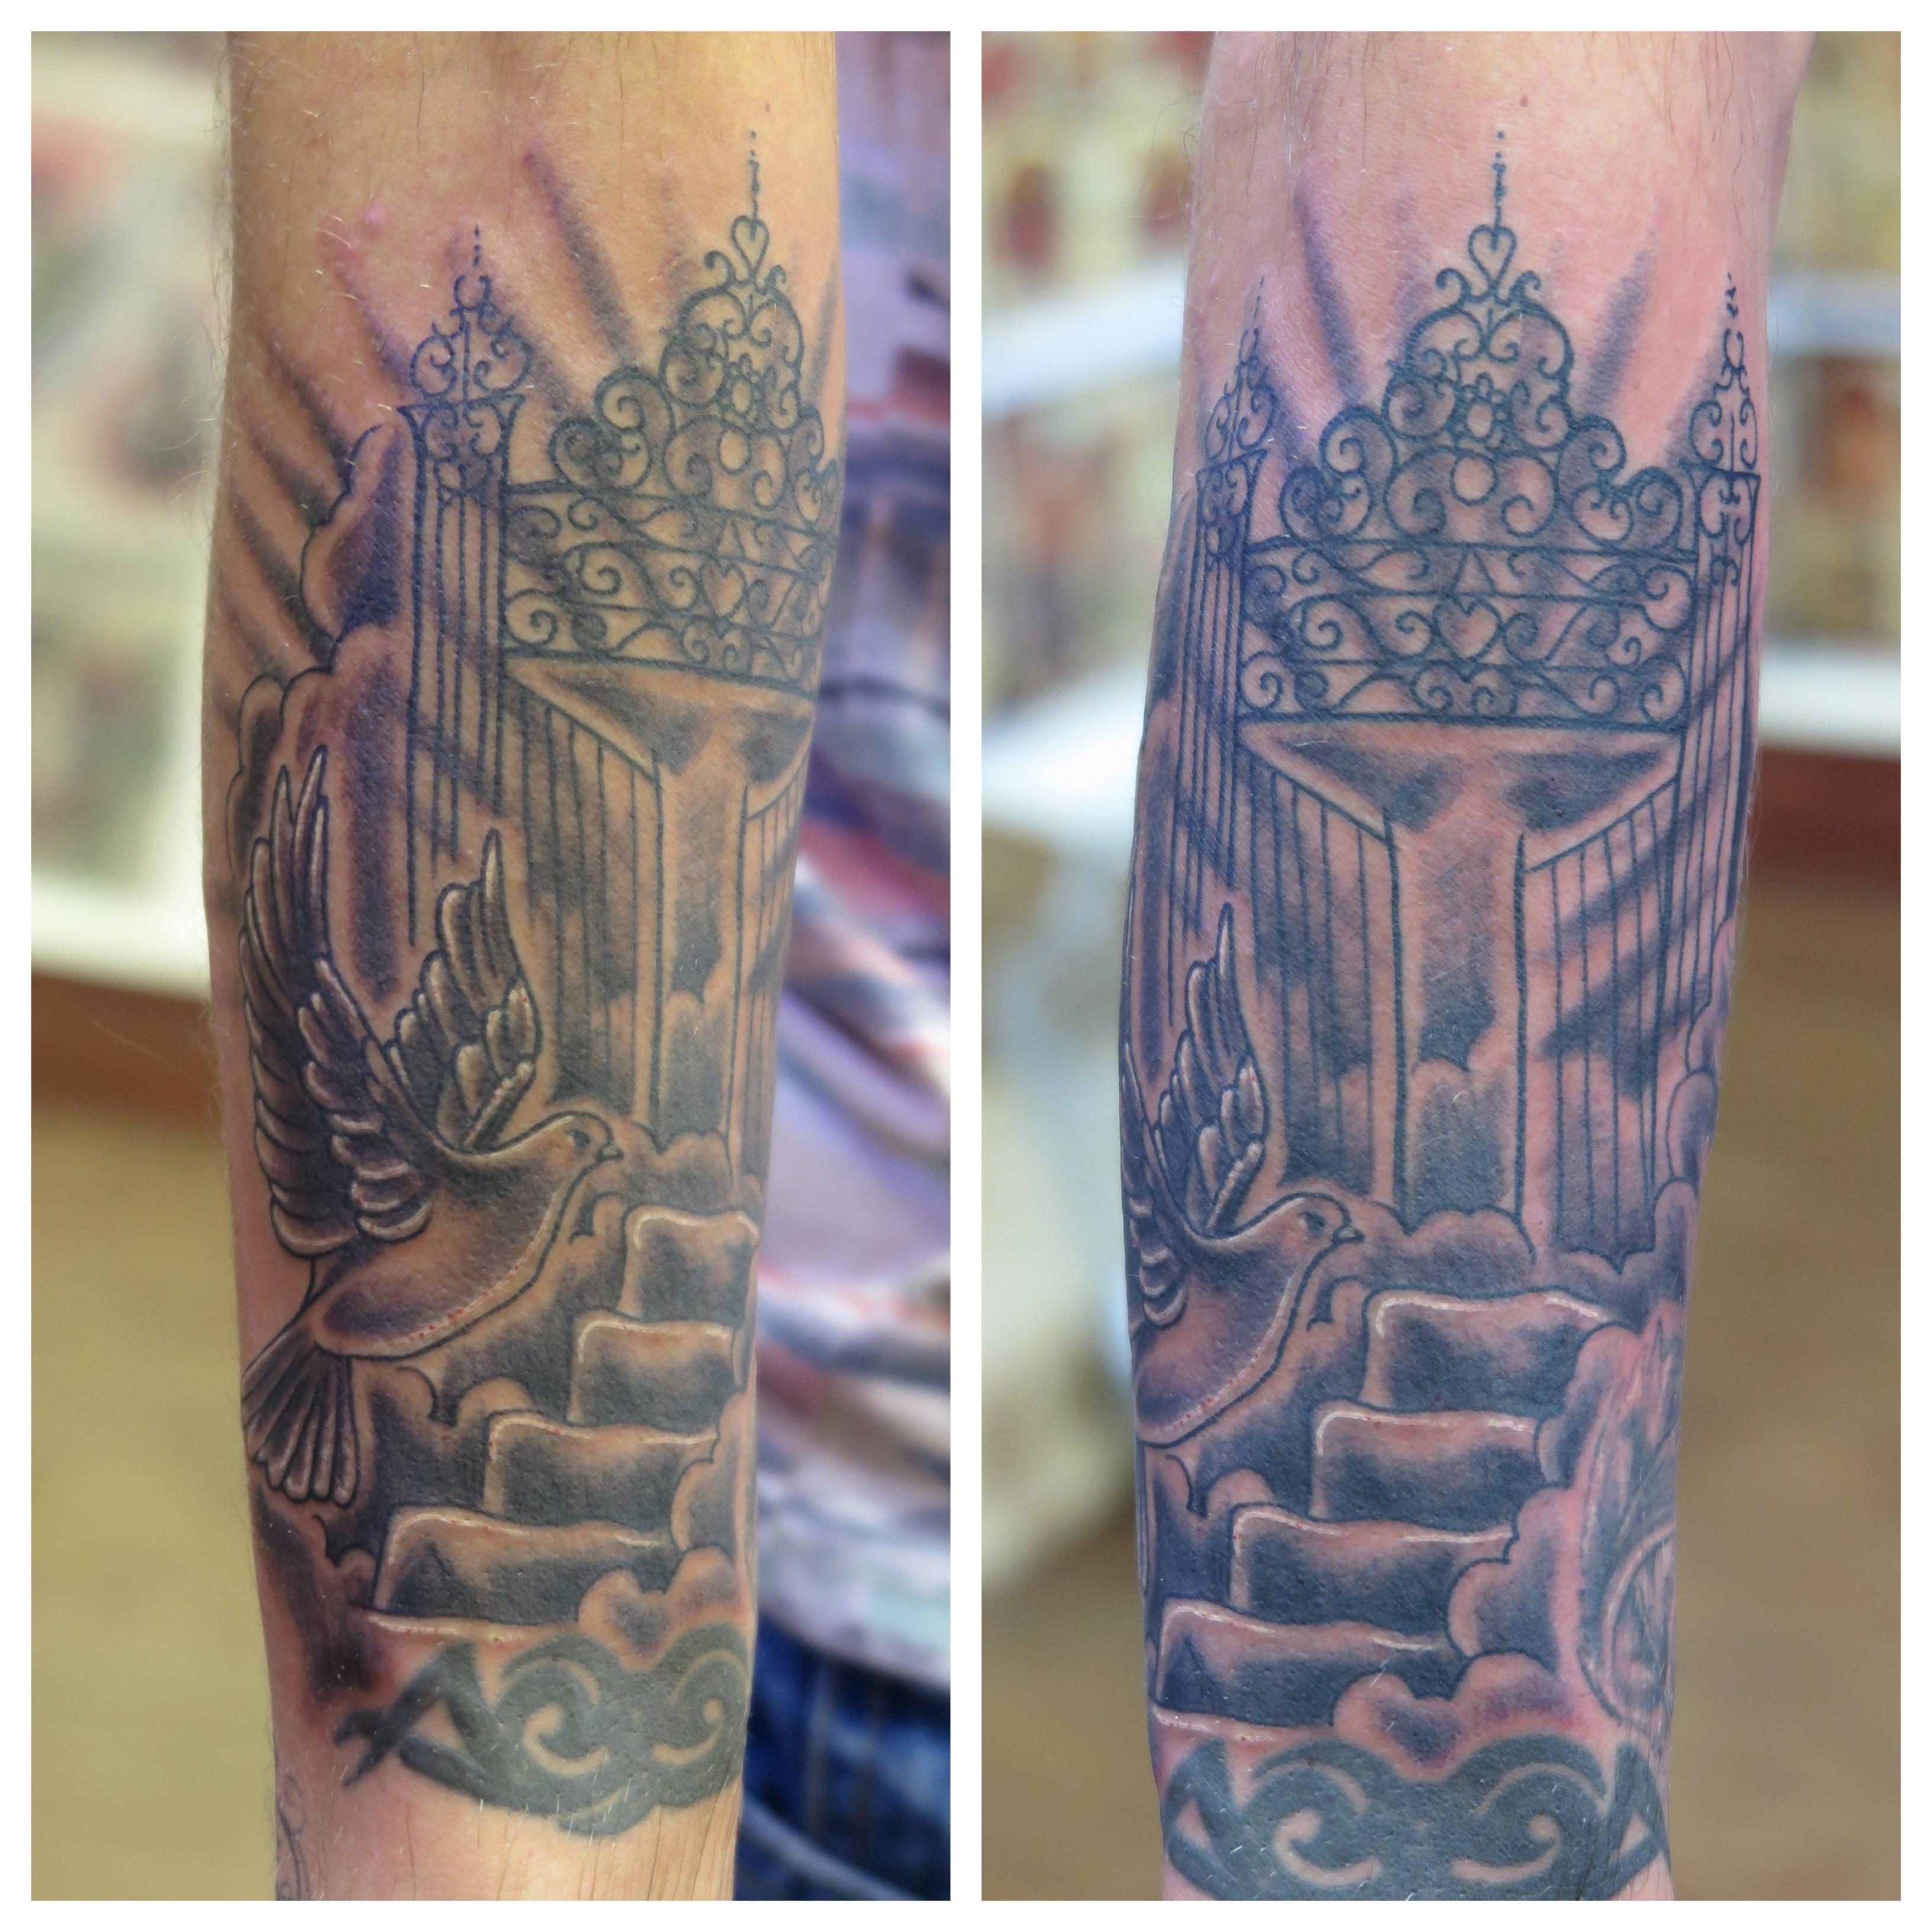 Religious irish st tattoo for Tattoos of heaven